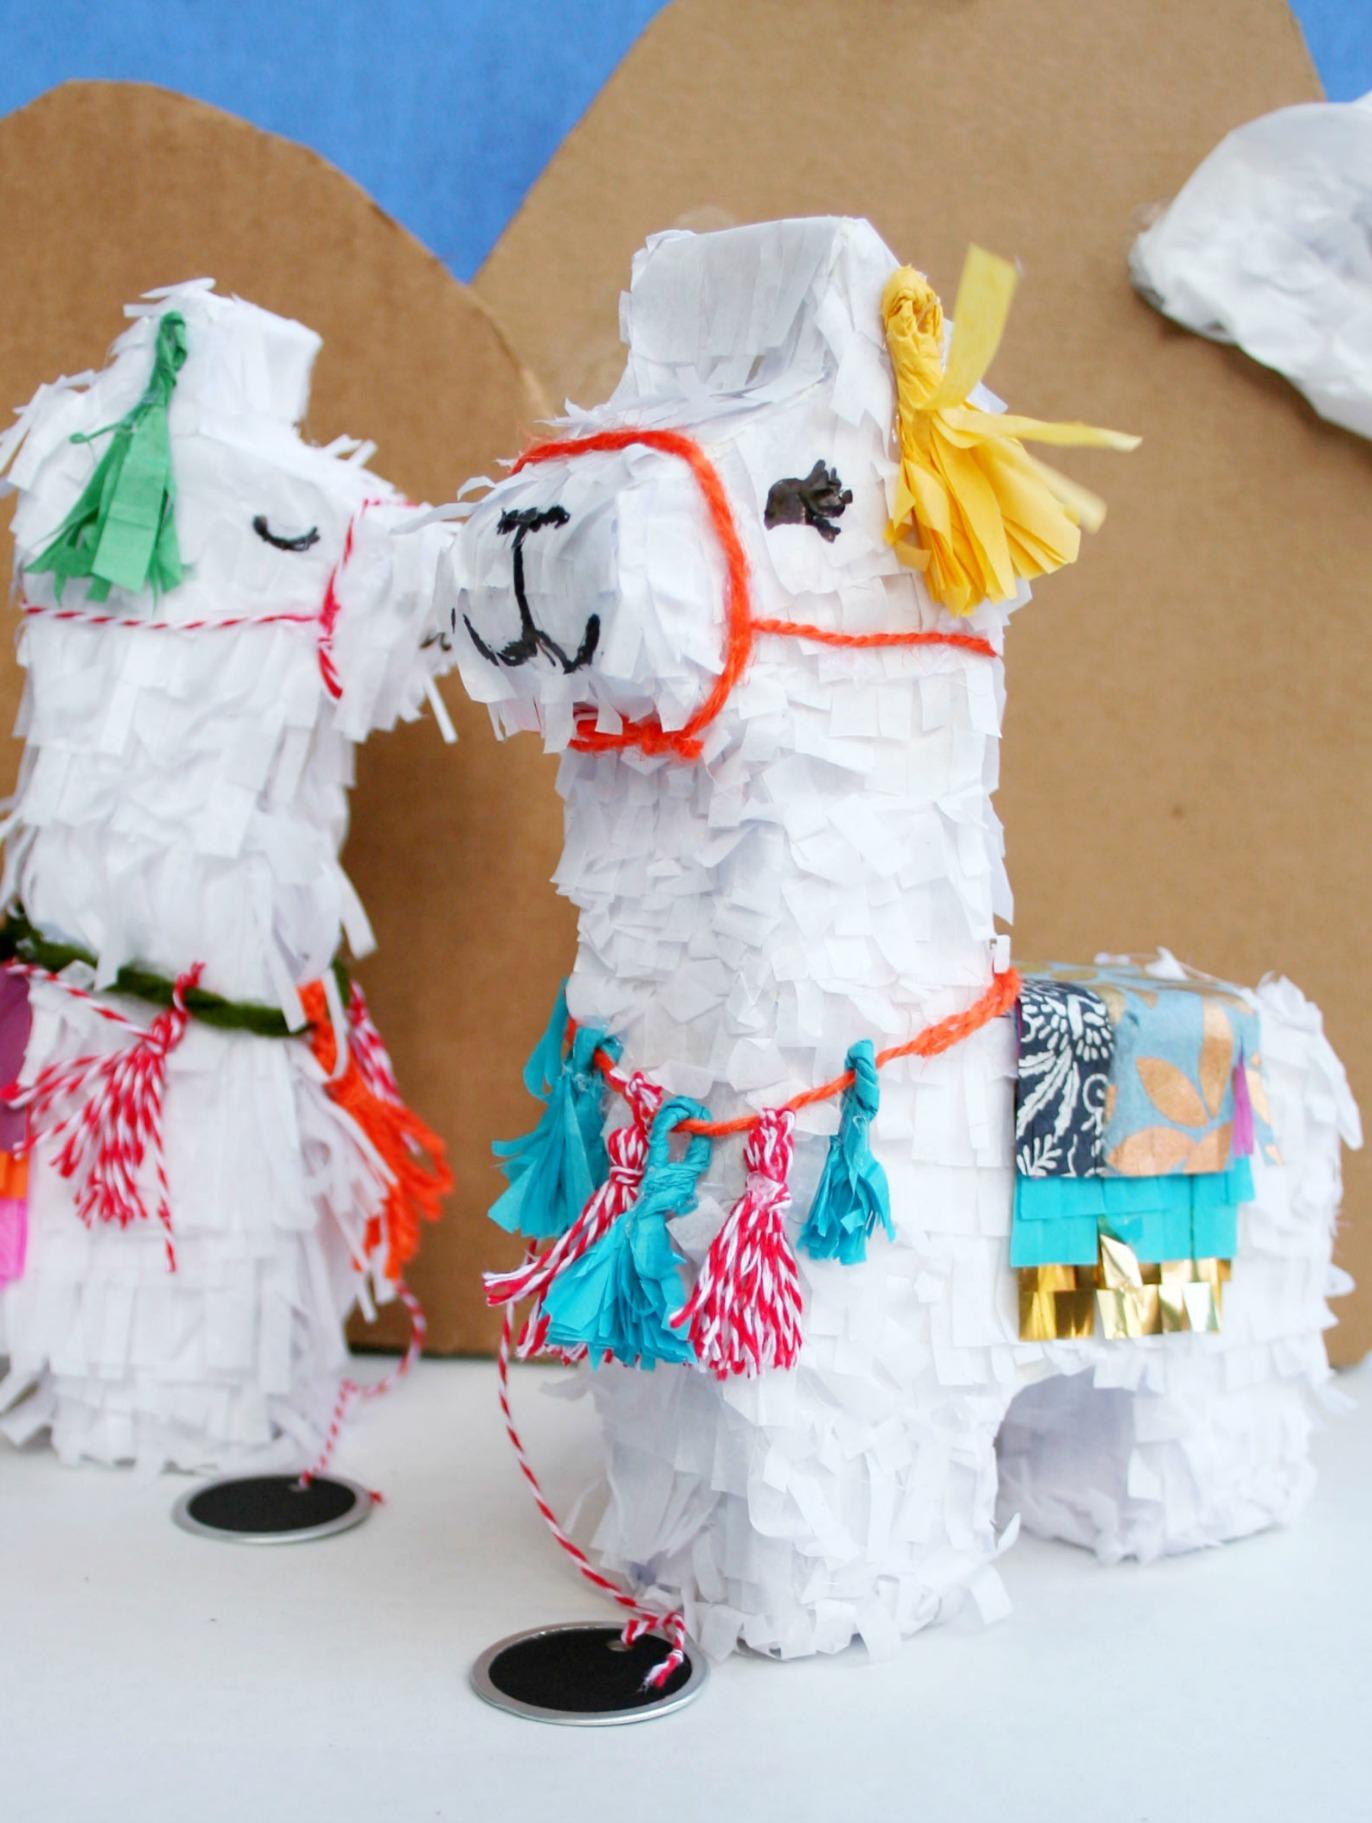 llama pinata invitations diy the brookhaven house. Black Bedroom Furniture Sets. Home Design Ideas